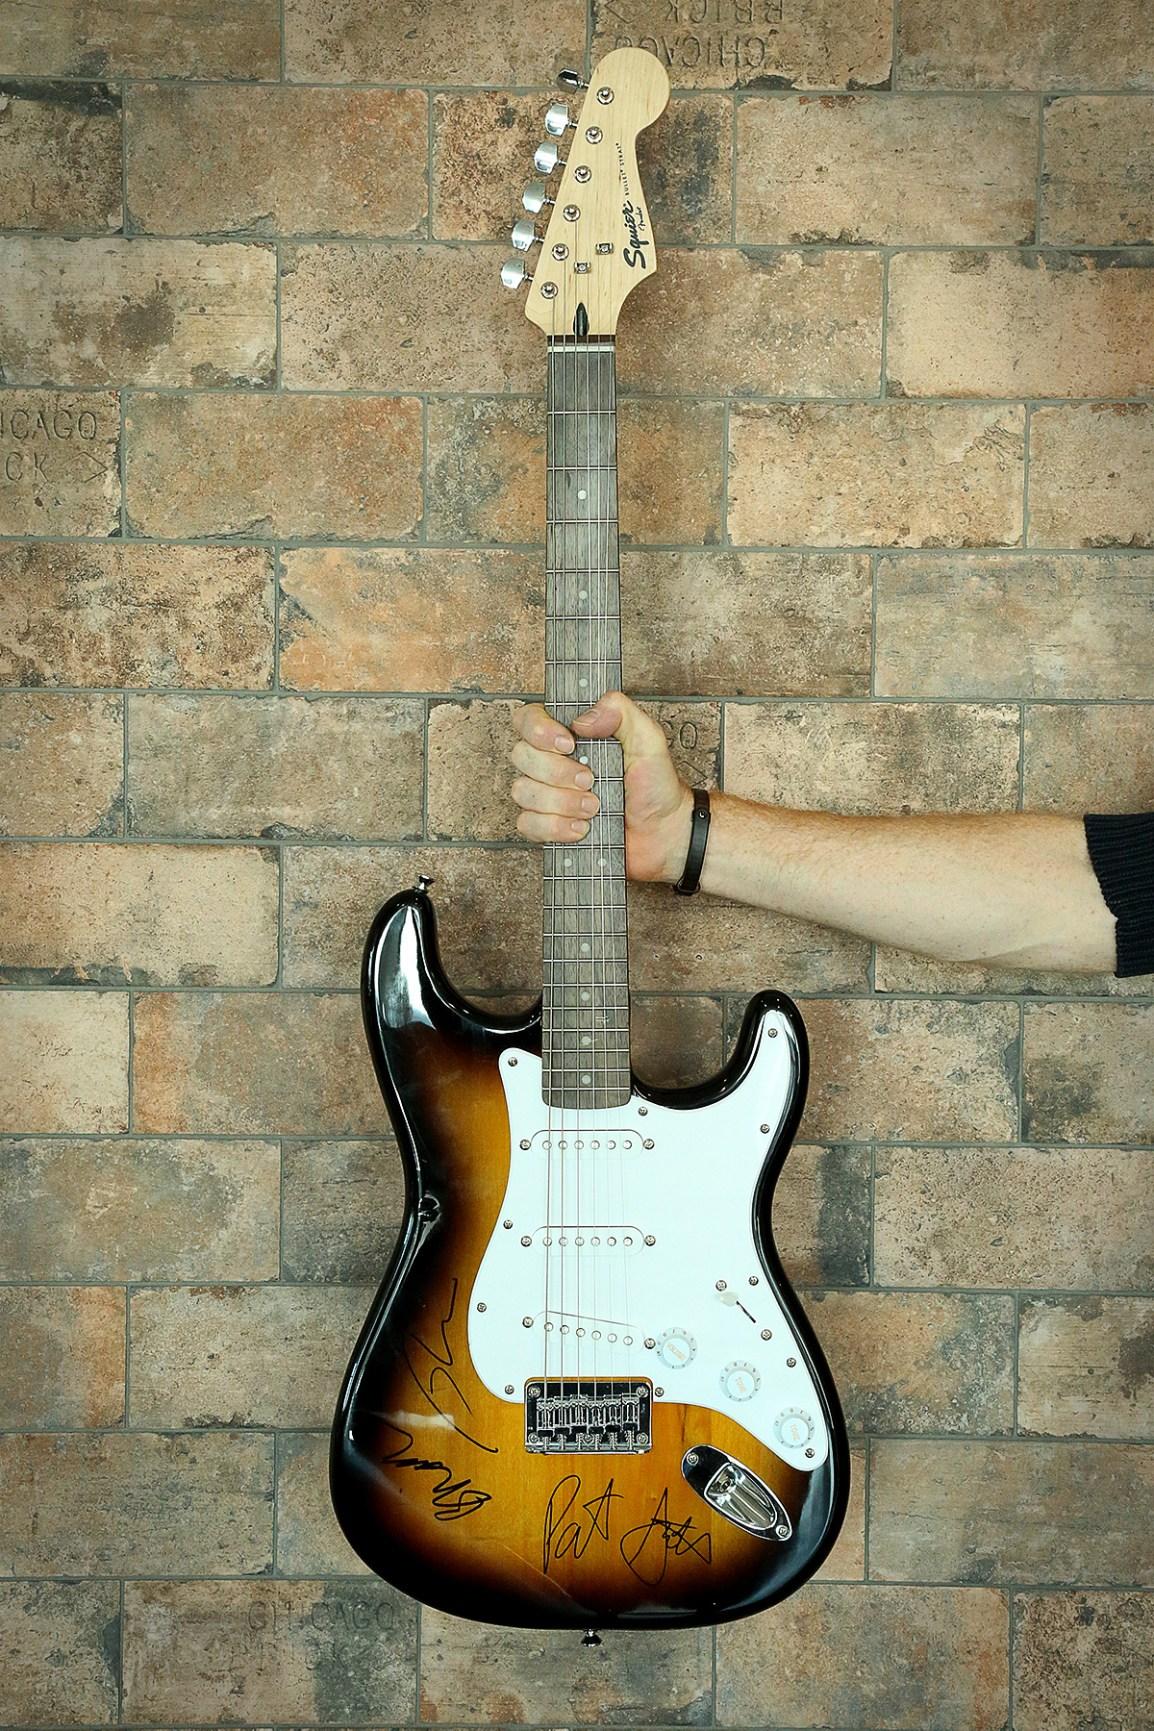 RE-Weeezer-guitar_1